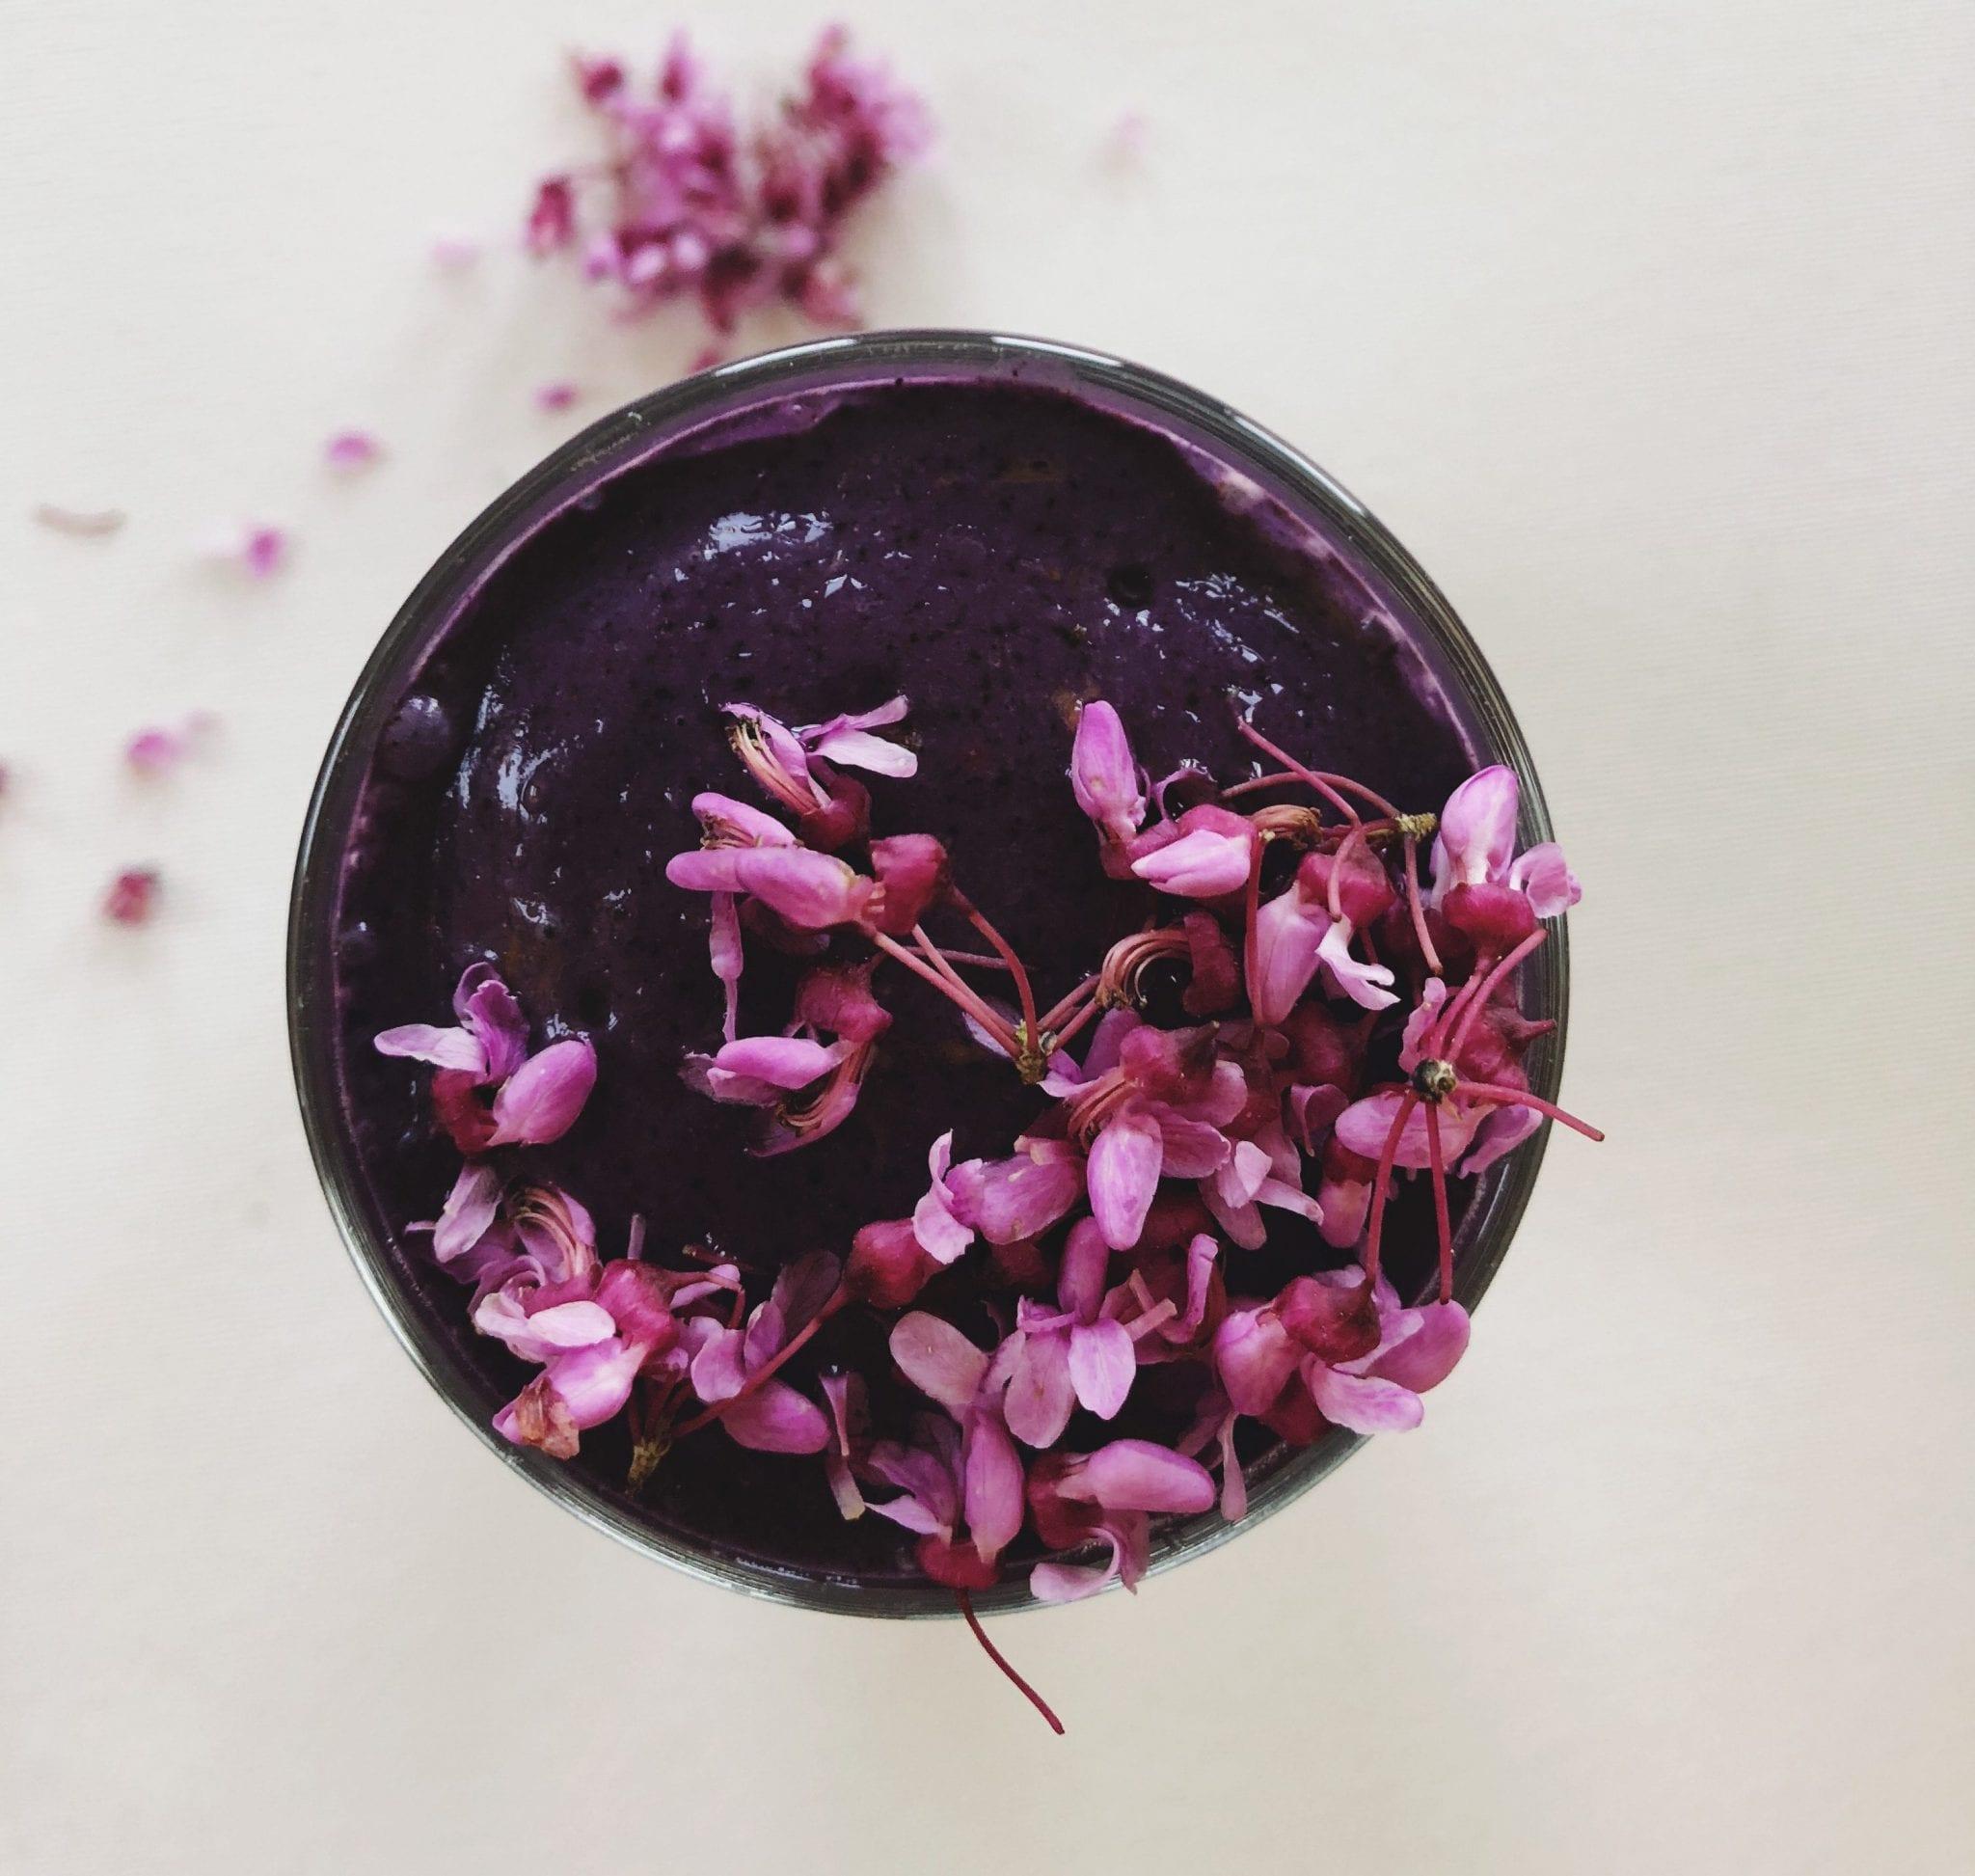 Blueberry Tart Adaptogenic CBD Smoothie | Soul Addict CBD